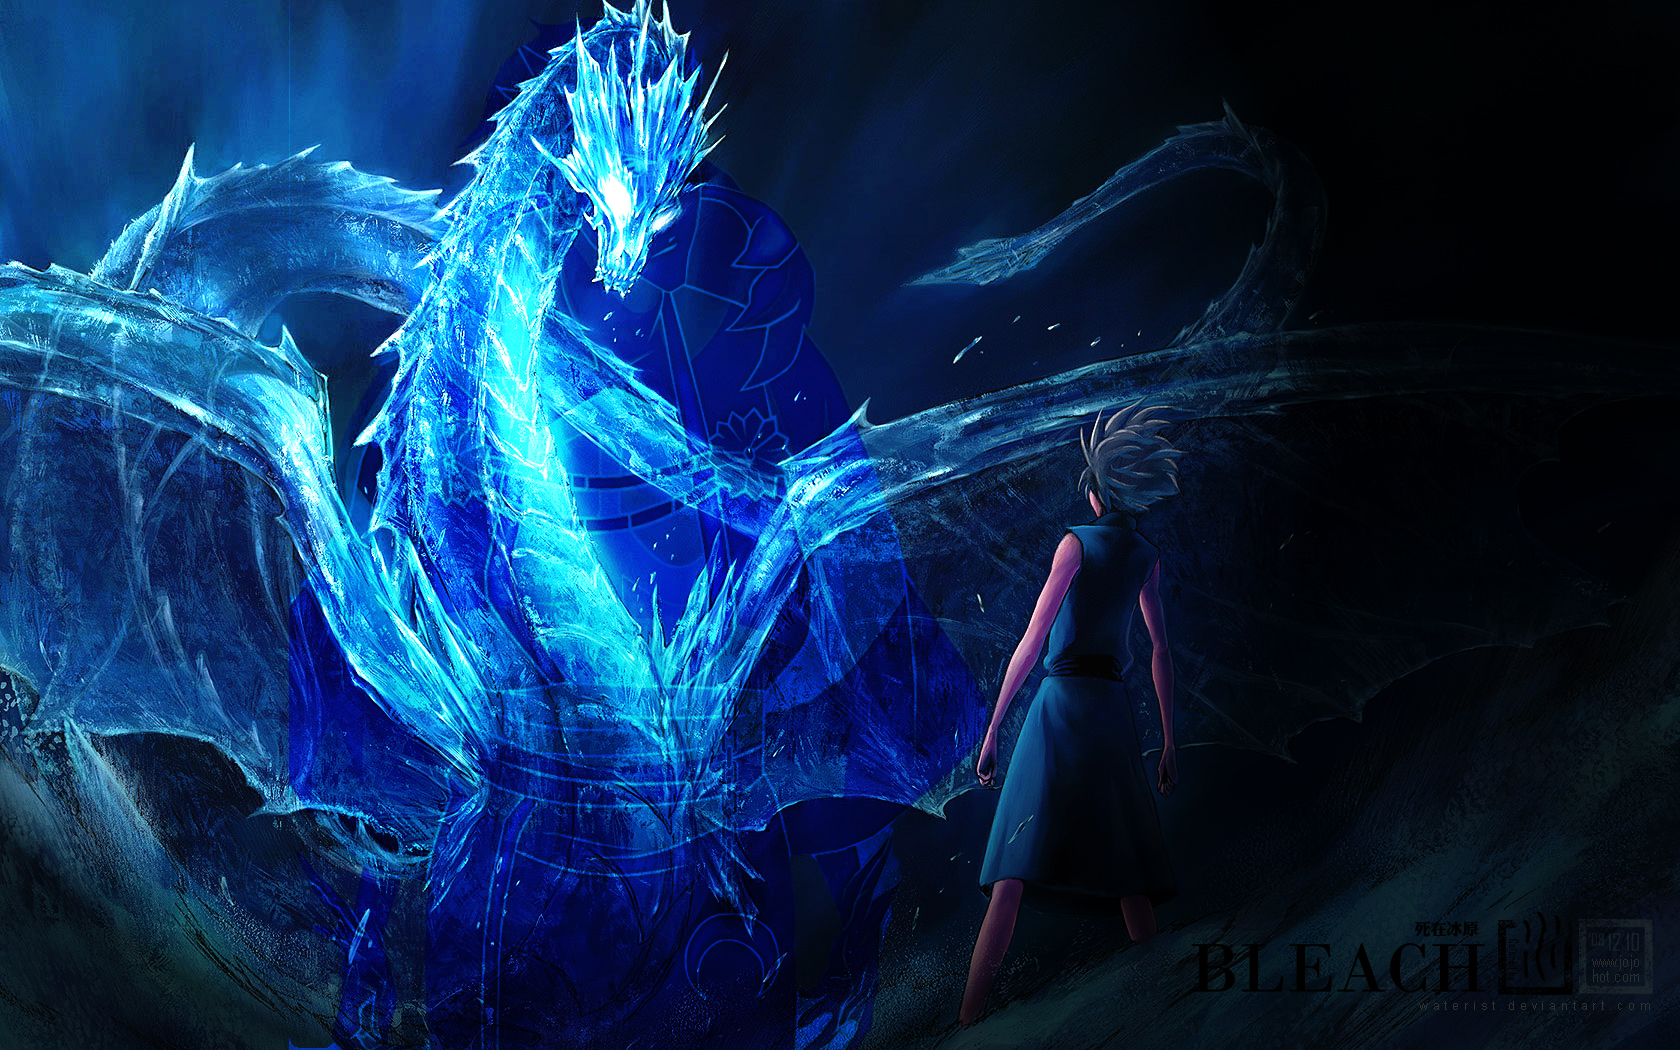 Download Blue Dragon Bleach Wallpaper 1680x1050 | Full HD Wallpapers